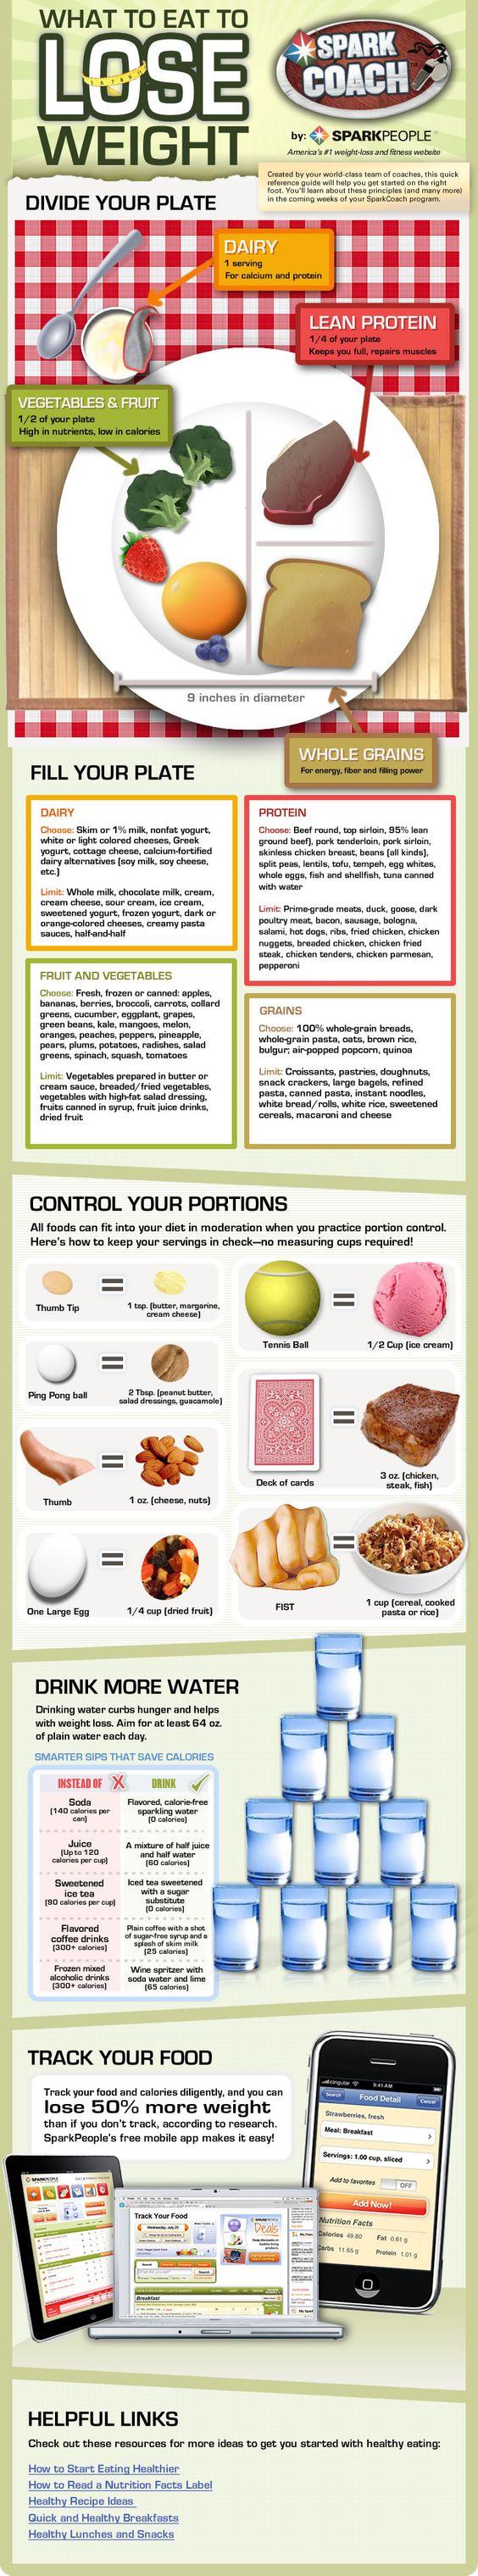 Top 10 healthy fat burning foods